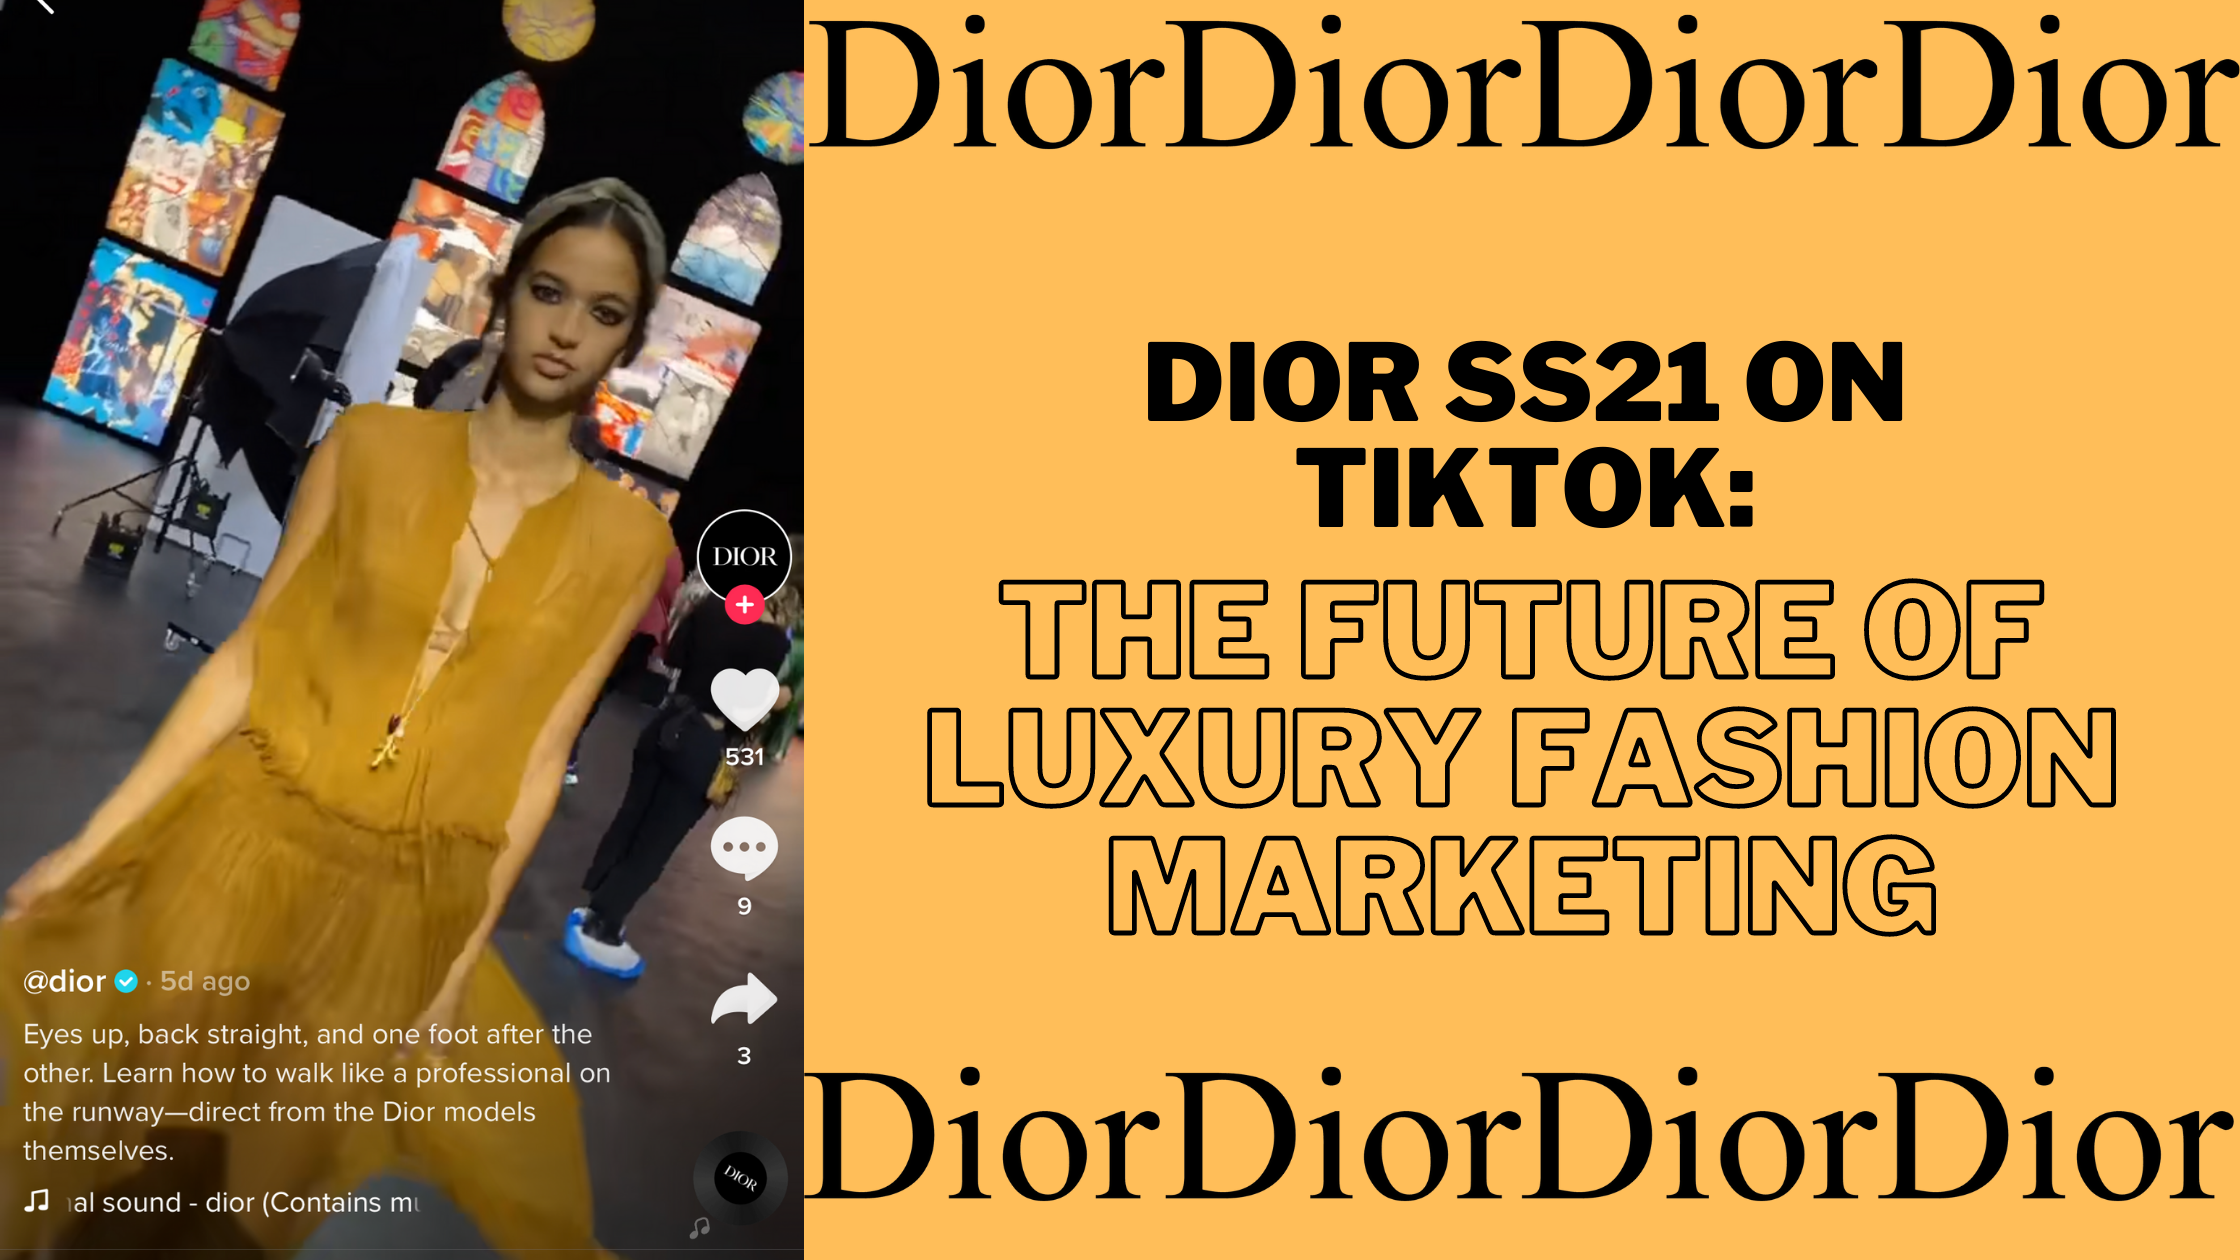 Dior Collabs With TikTok: The Future Of Luxury Fashion Marketing